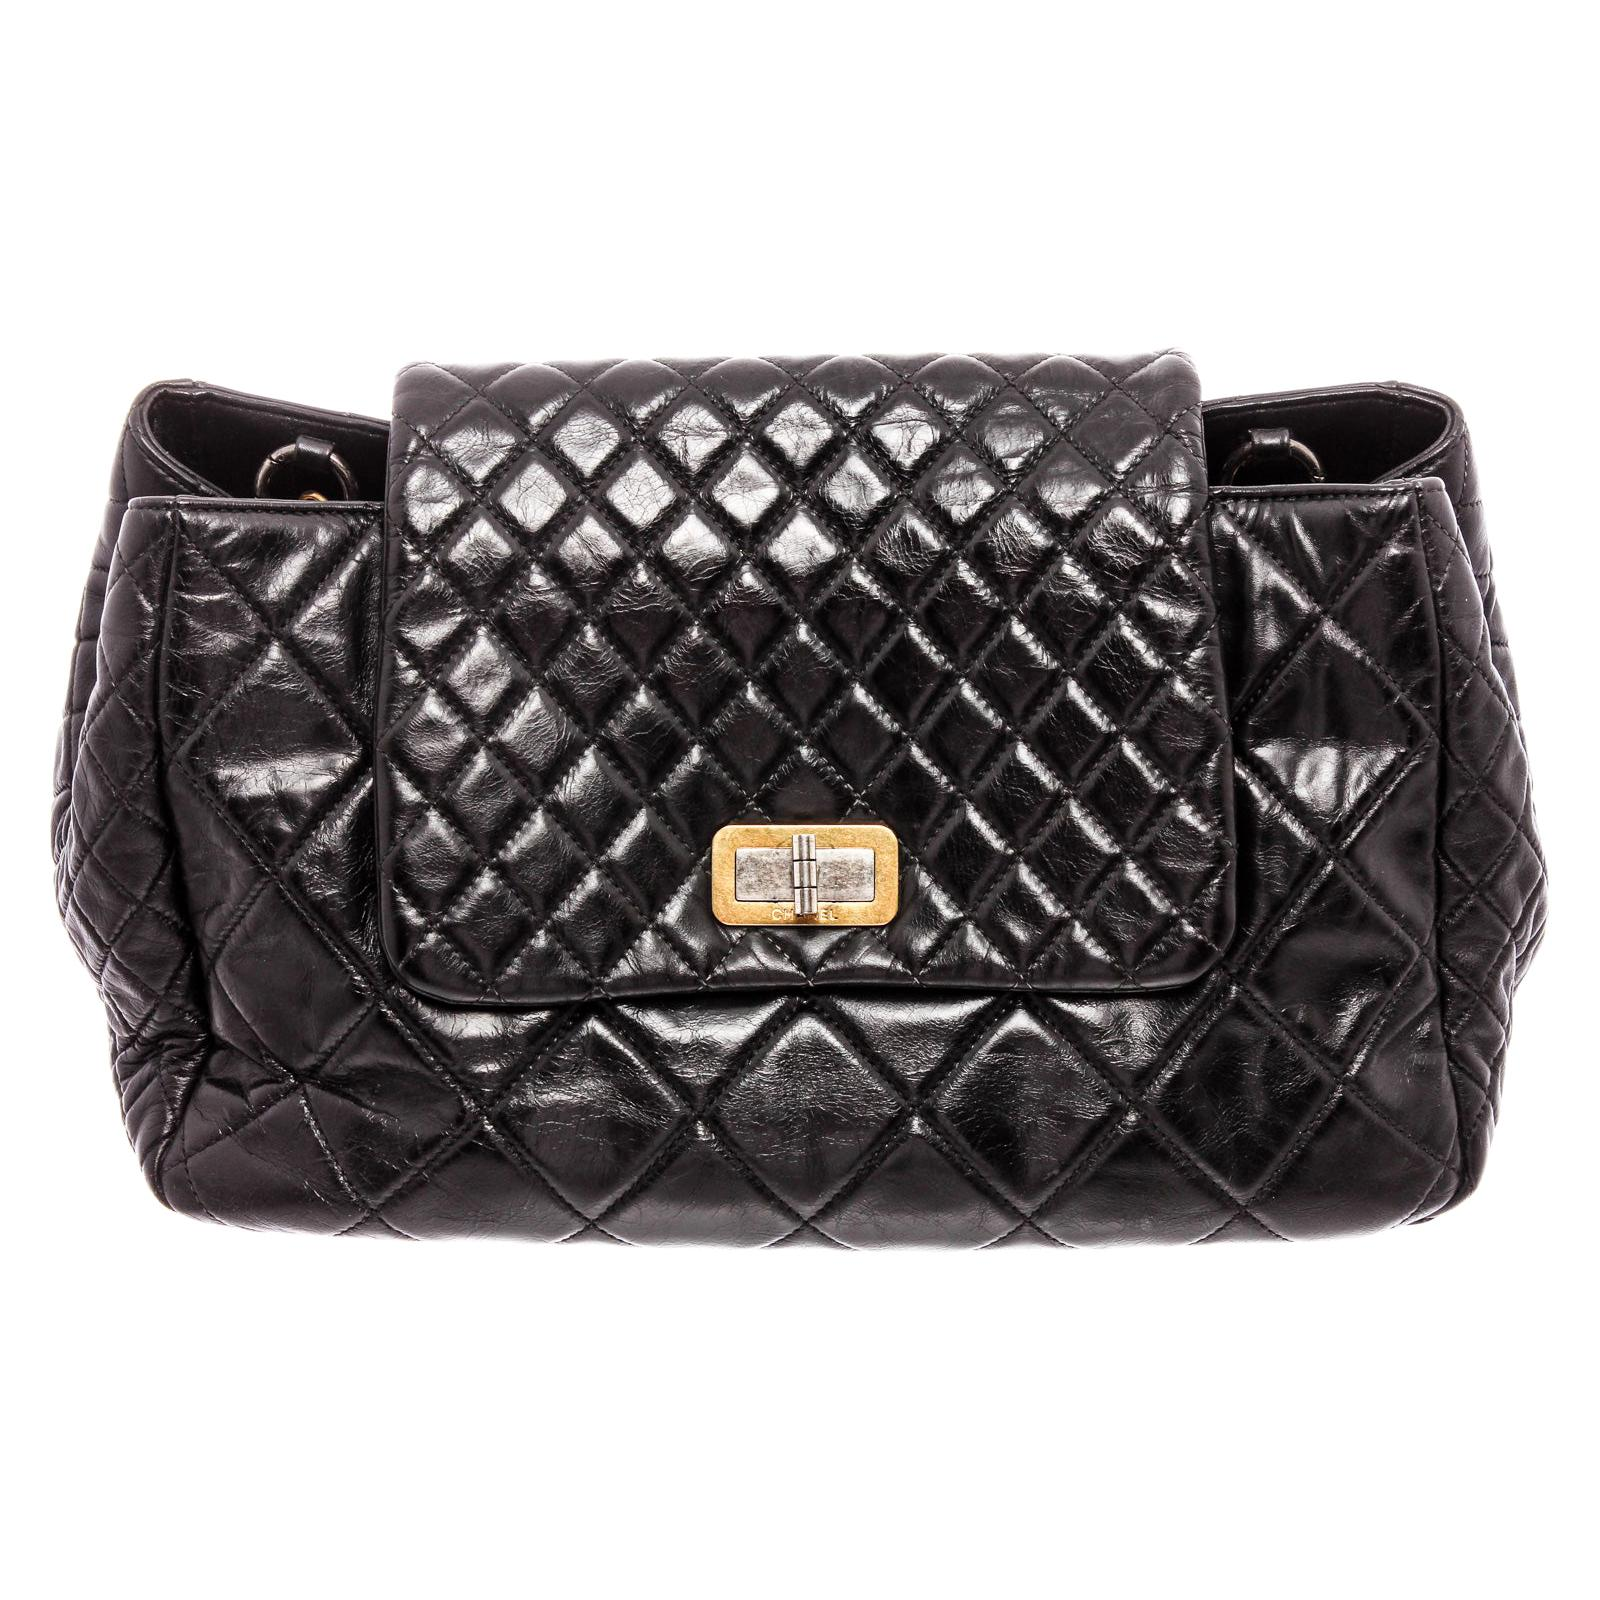 Chanel Black Lambskin Leather Reissue Accordion Flap Bag